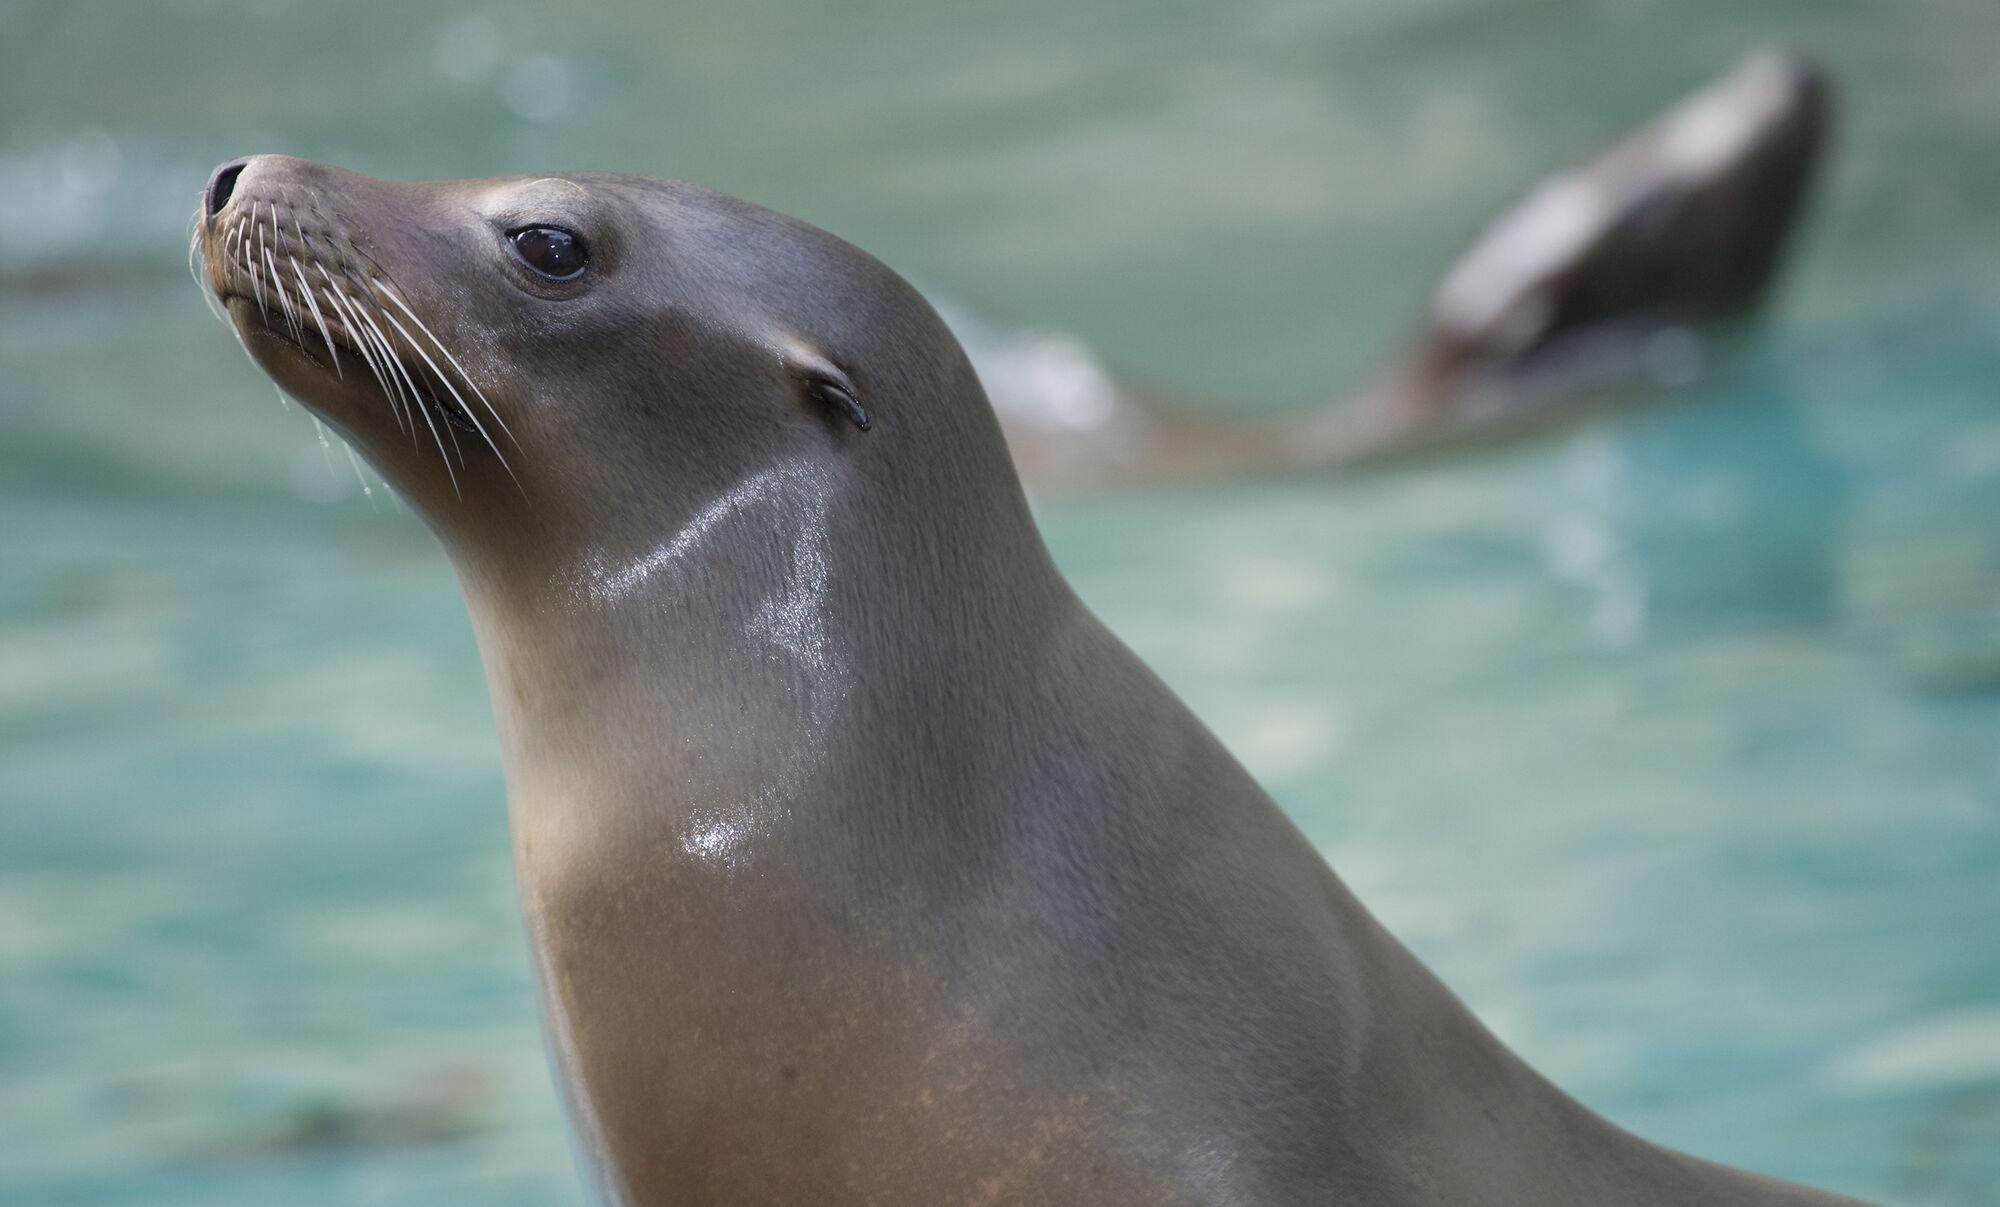 California Sea Loin | Zoopedia Wiki | FANDOM powered by Wikia